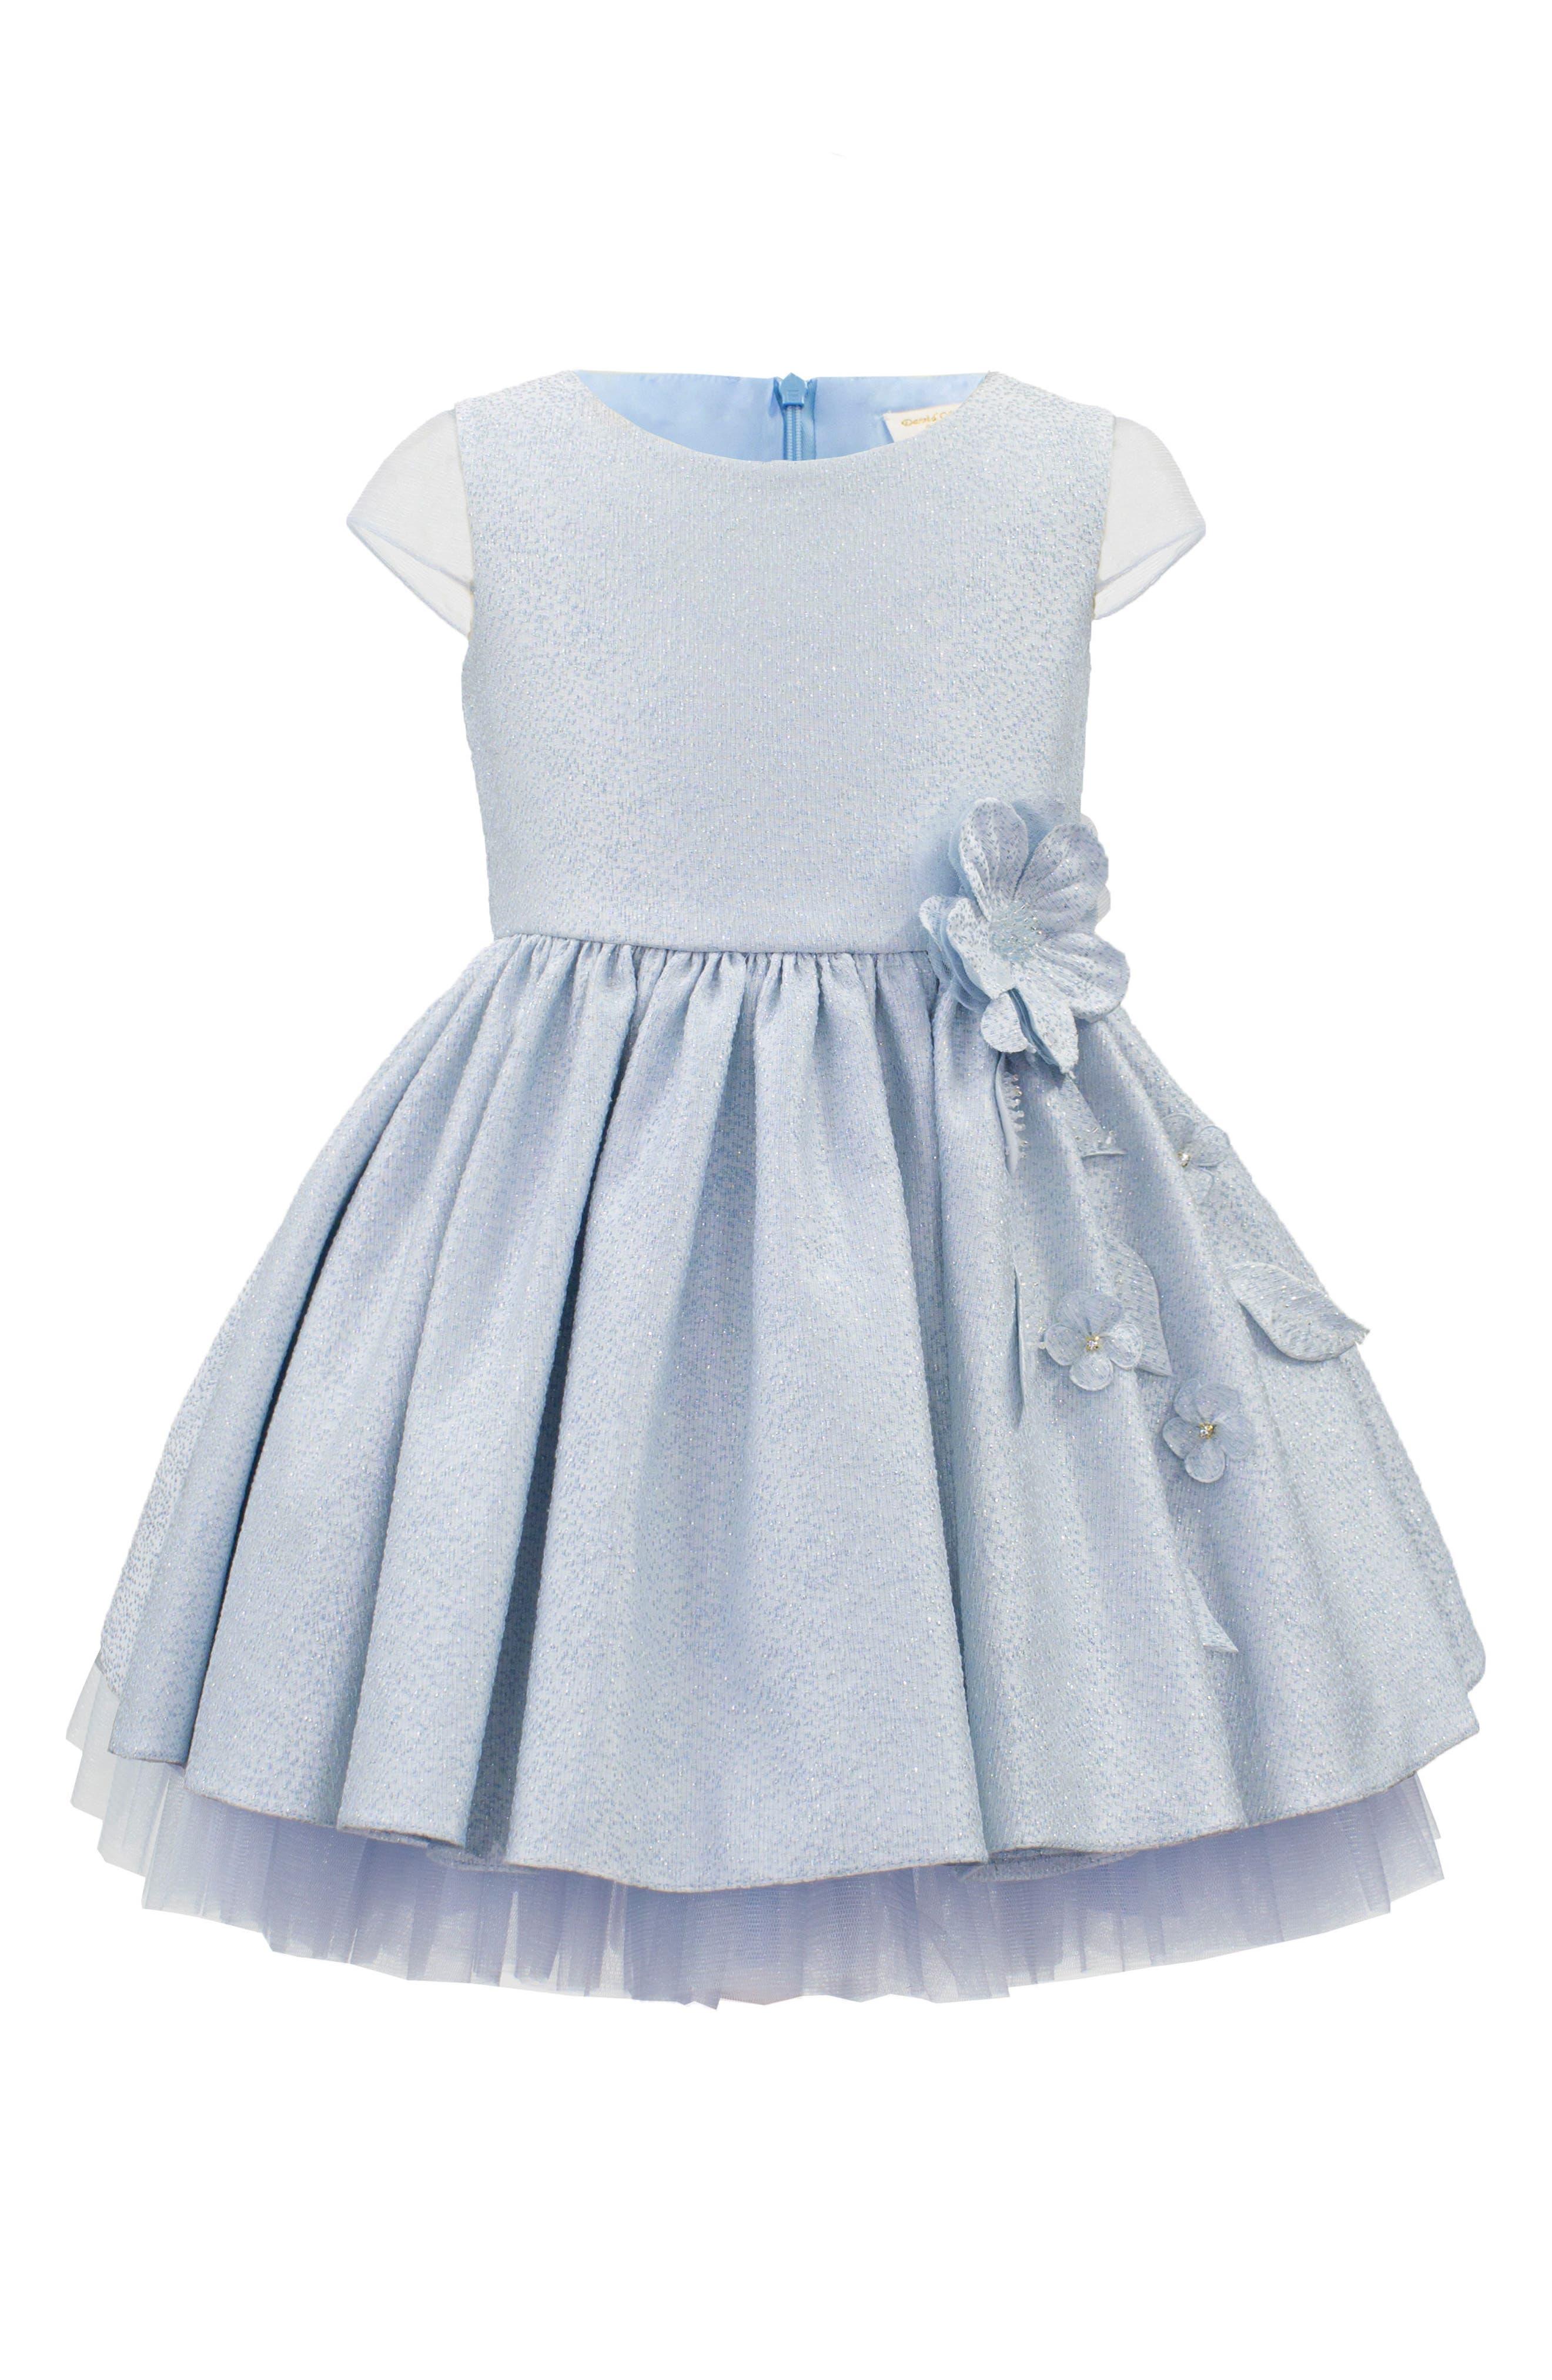 Main Image - David Charles Brocade Party Dress (Toddler Girls, Little Girls & Big Girls)